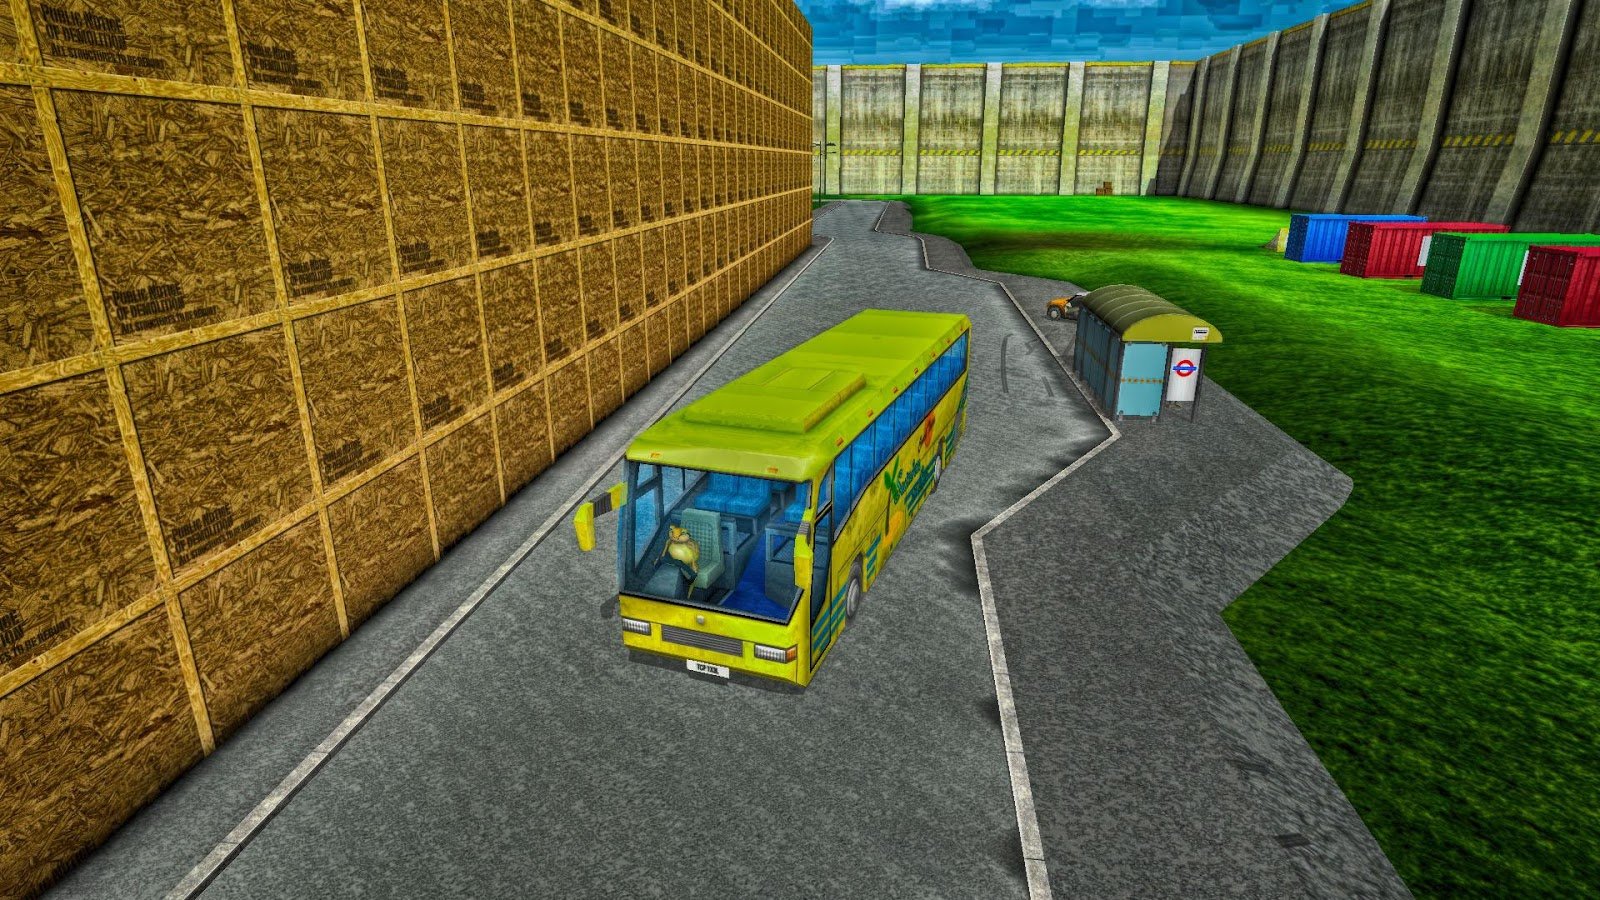 The Frog - Amazing Simulator 이미지[4]